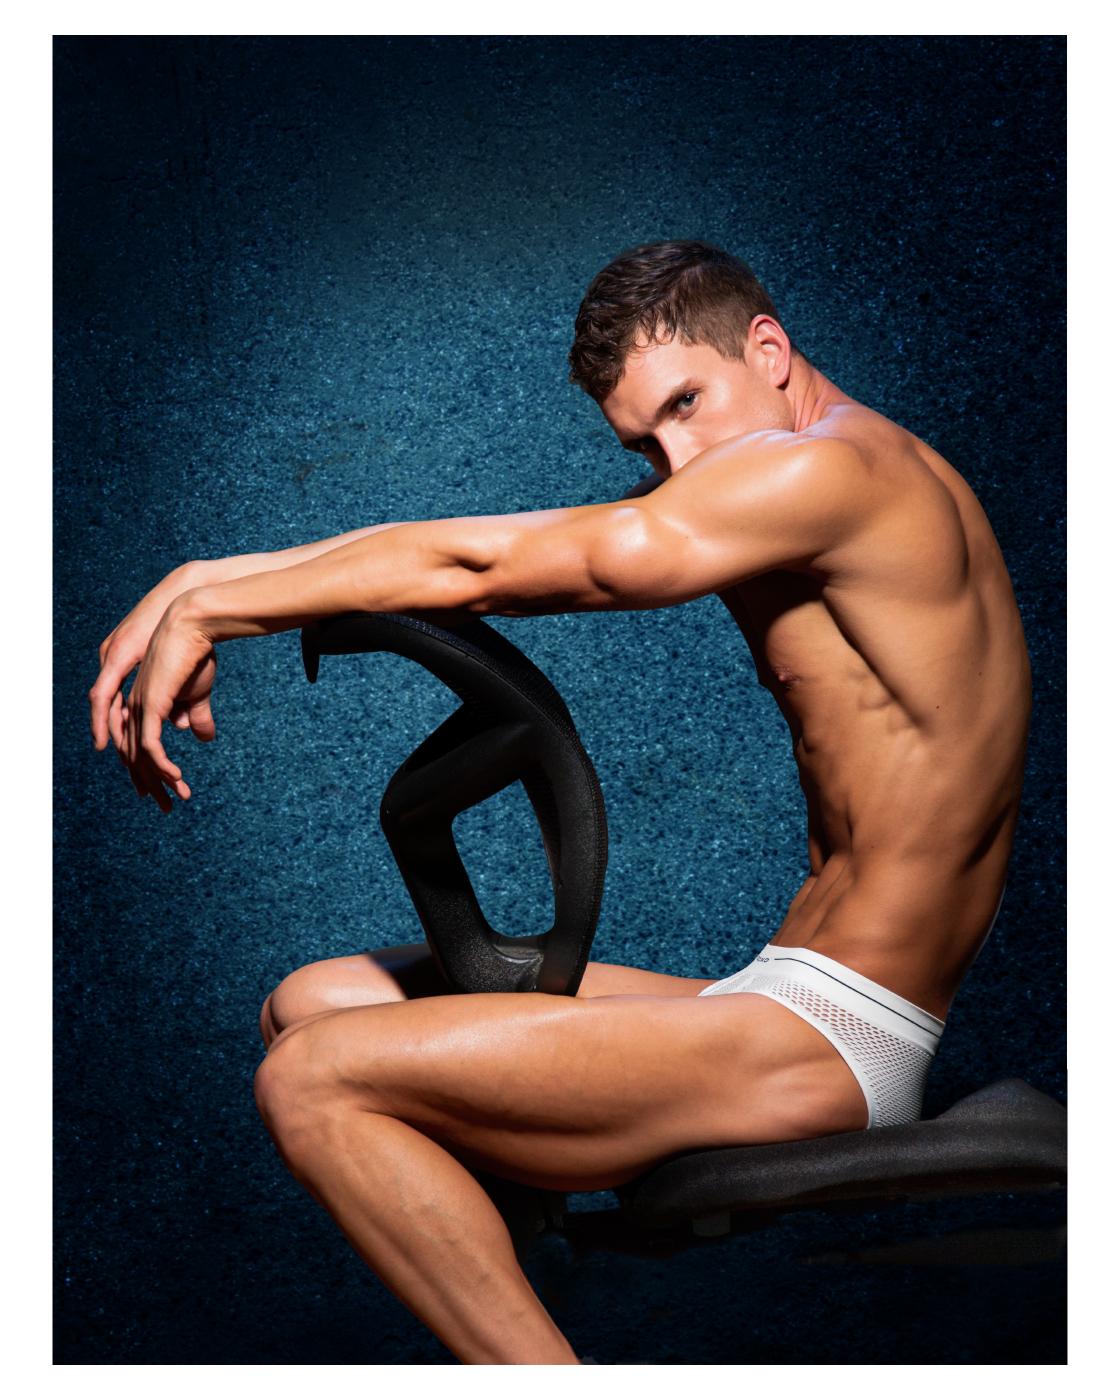 Tym Roders by Hans Fahrmeyer - Jocko underwear